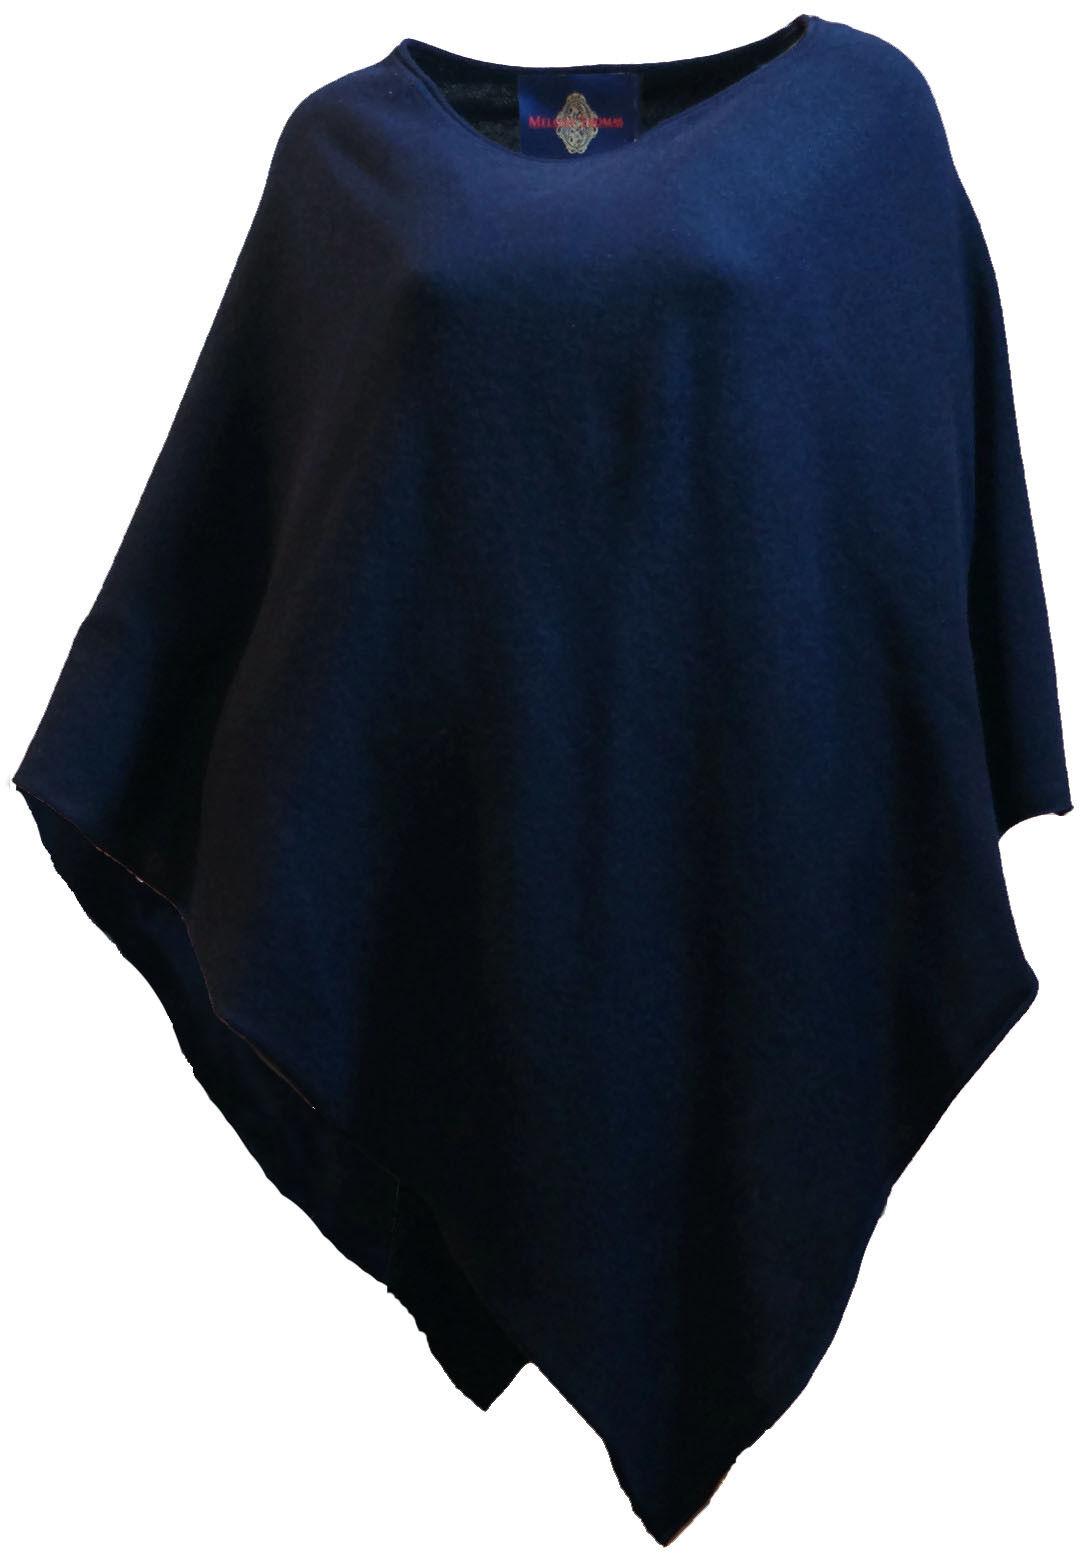 Melody Thomas Studio Designer 100% Pure Cashmere Navy bluee Ponchos Sweater Knit